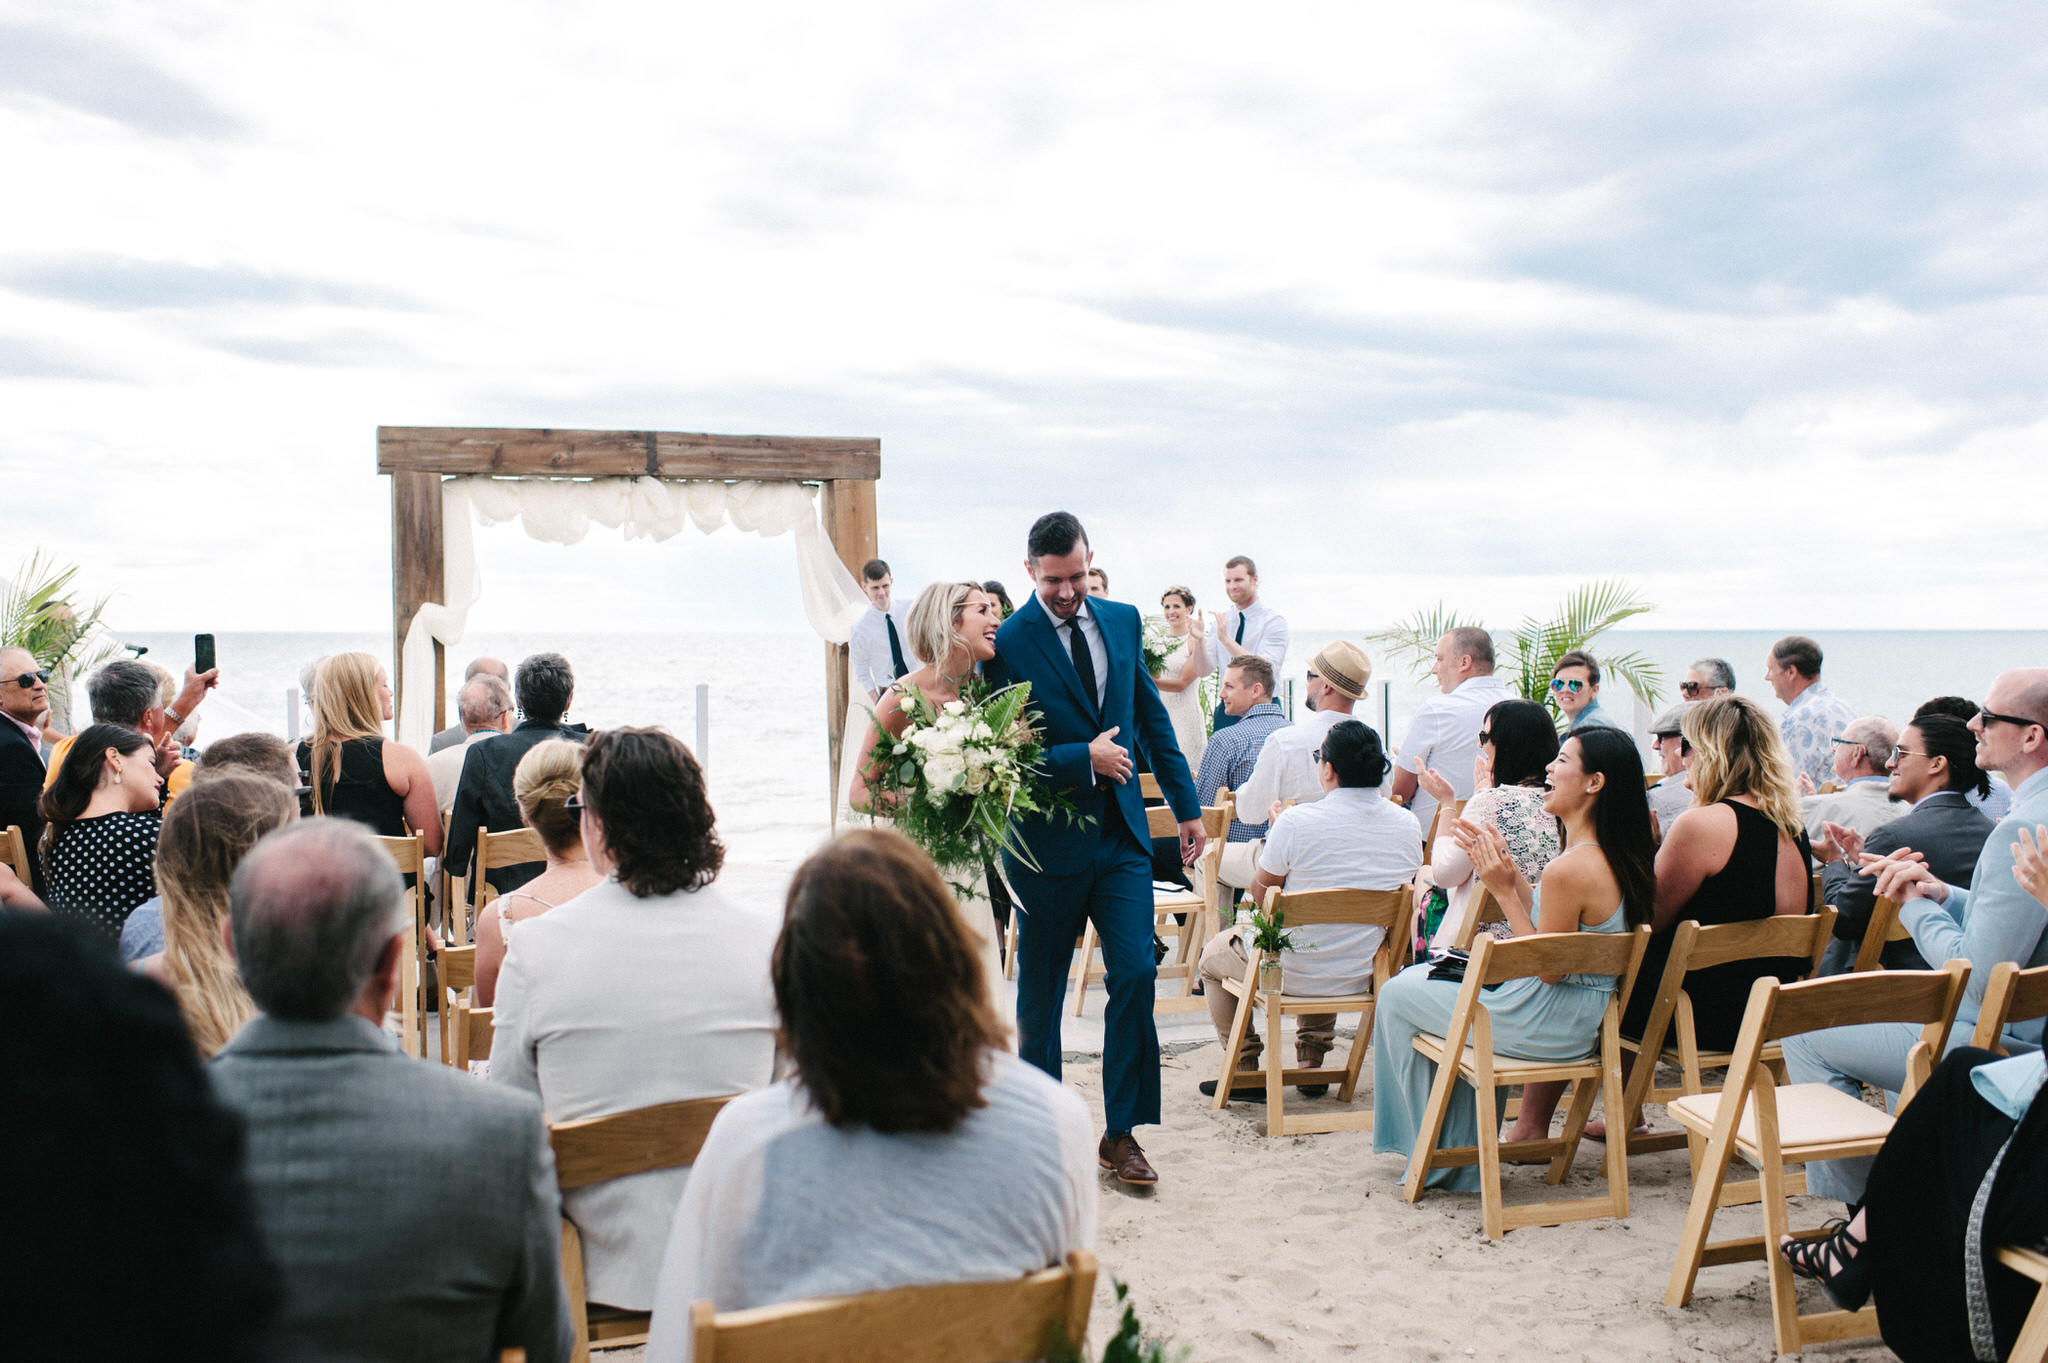 toronto wedding photography scarlet oneill097.JPG